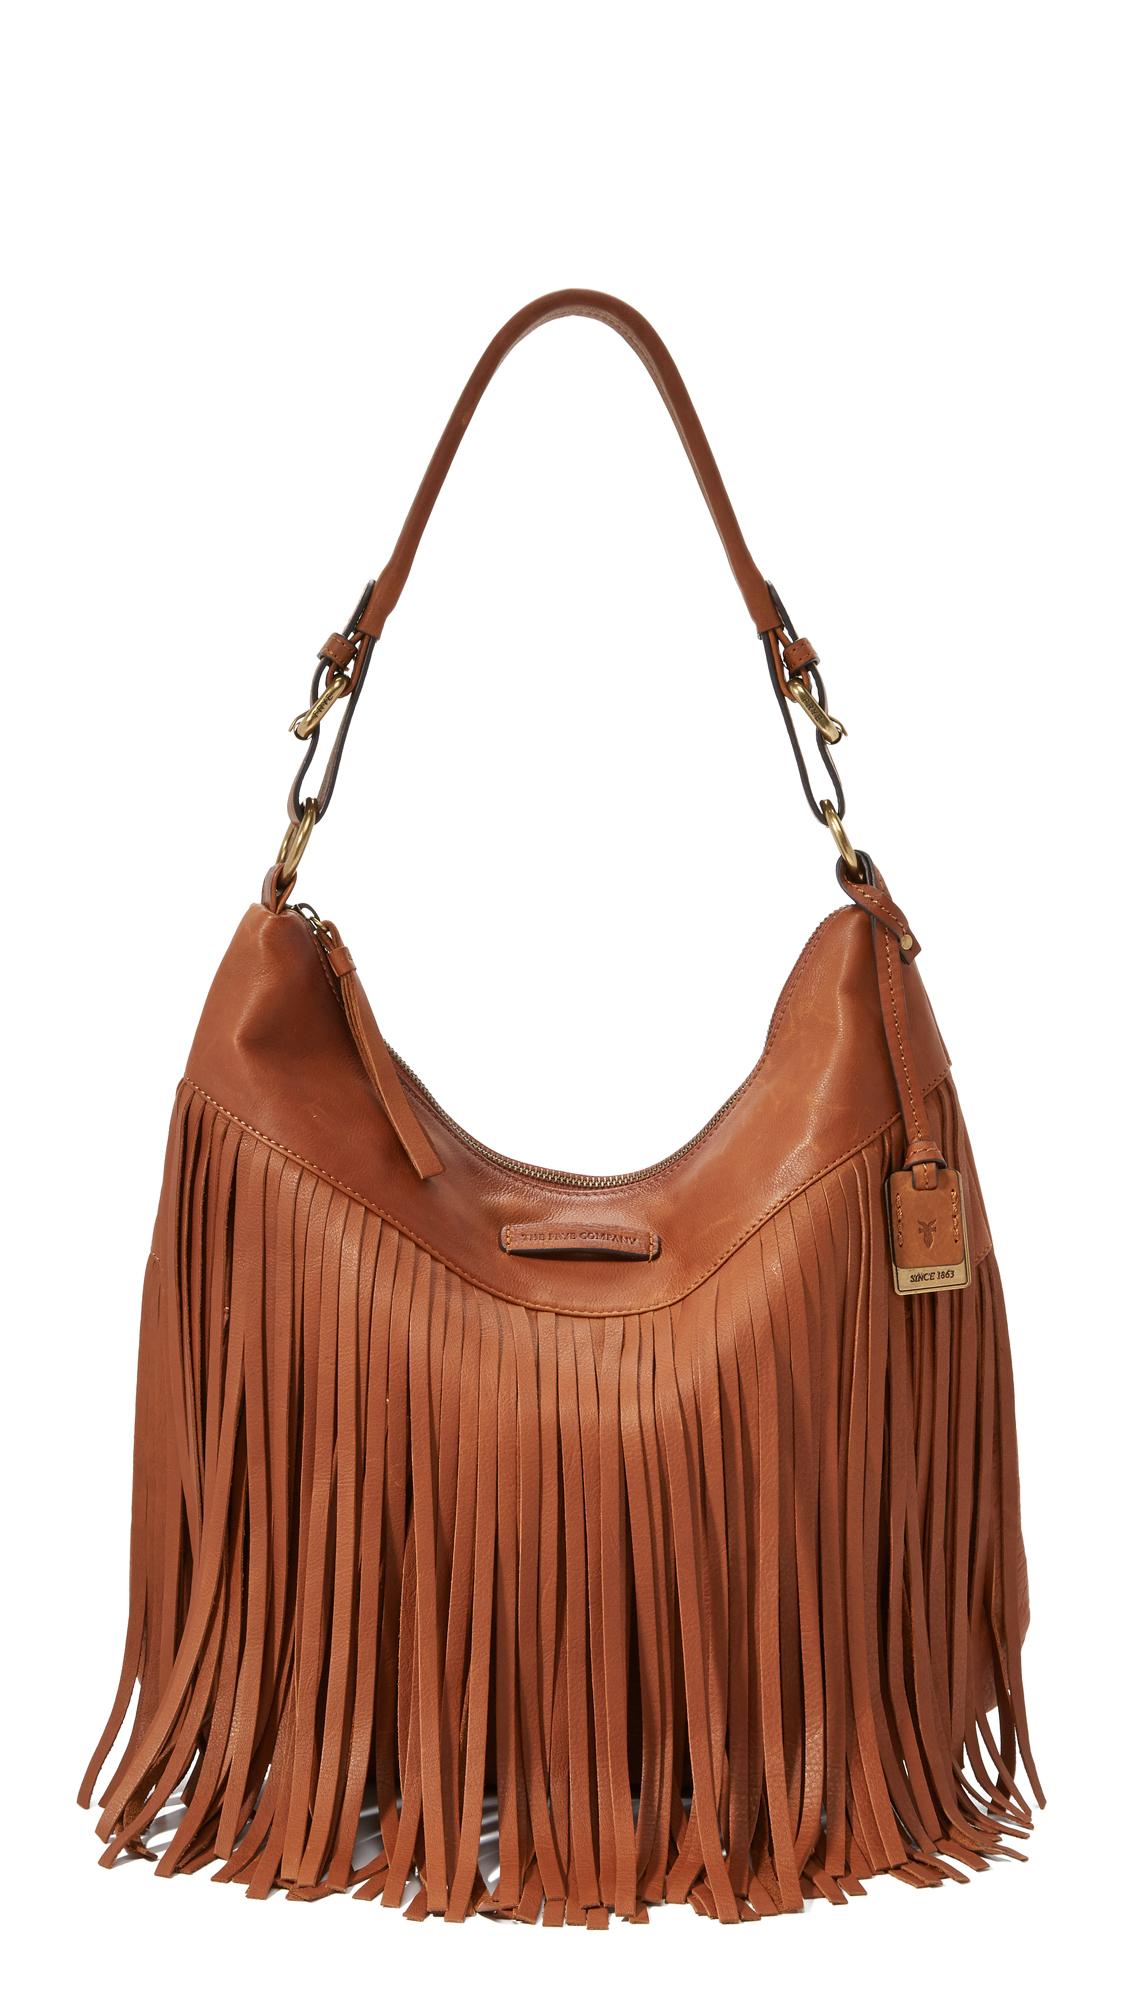 Frye Heidi Fringe Hobo Bag | SHOPBOP SAVE UP TO 25% Use Code: EOTS17